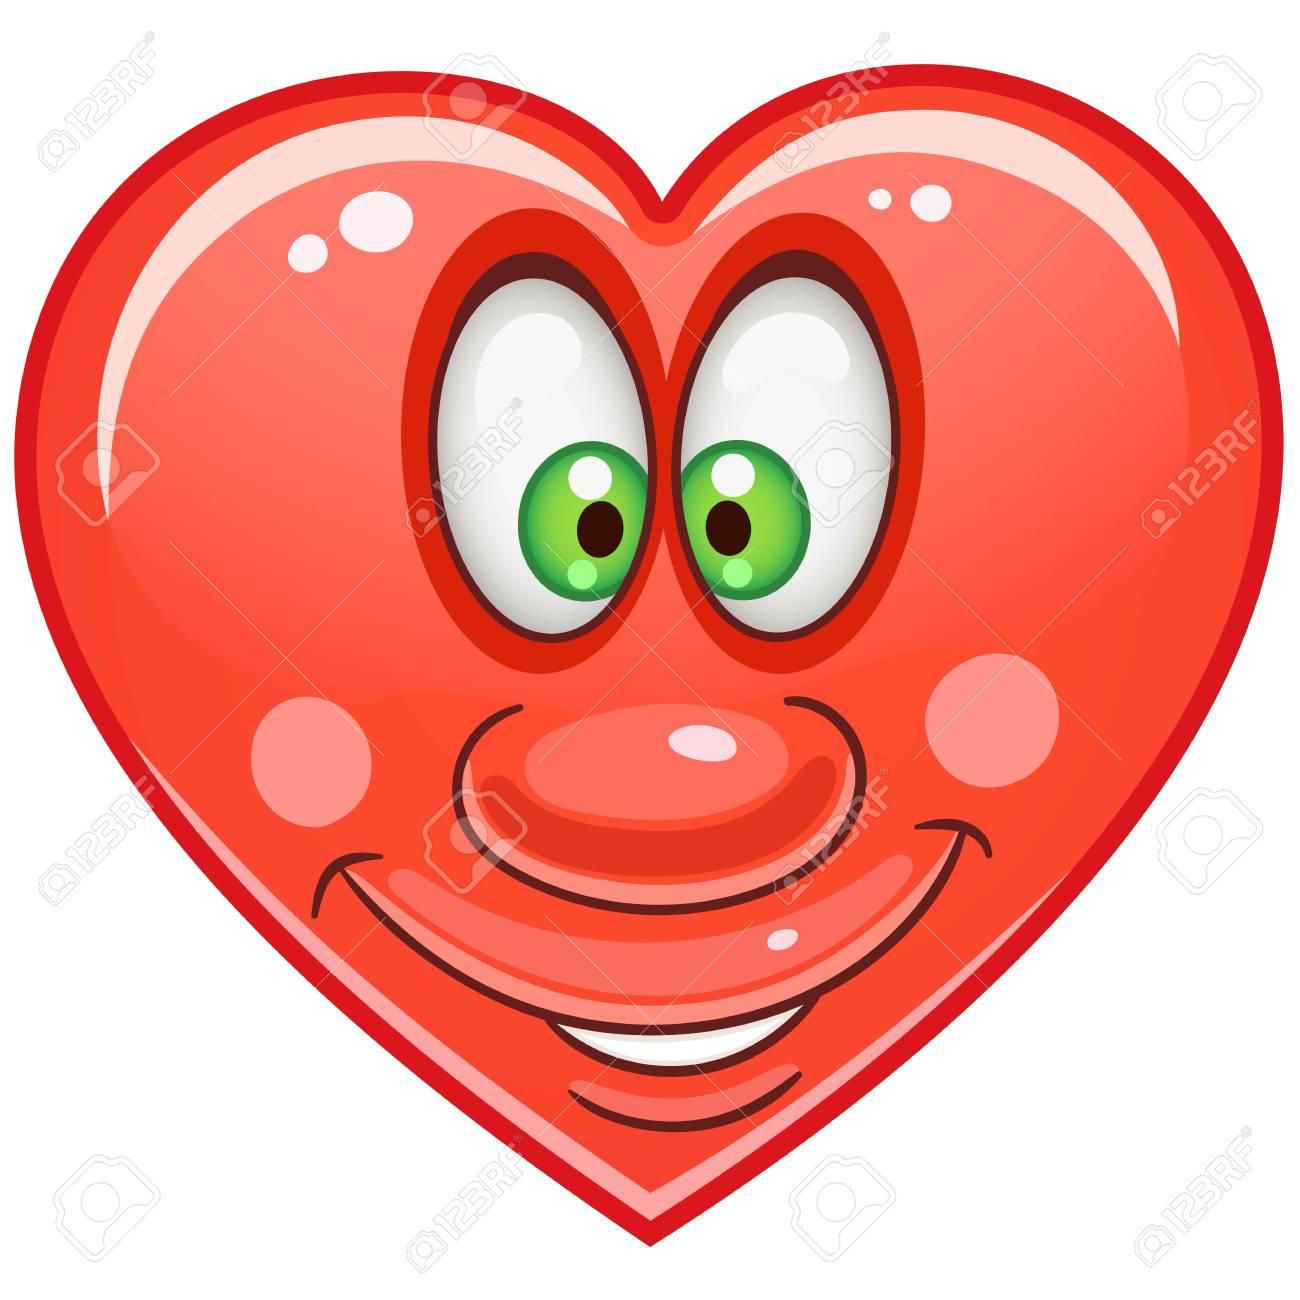 Cartoon Red Heart Emoticons Smiley Emoji Love Emotion Symbol